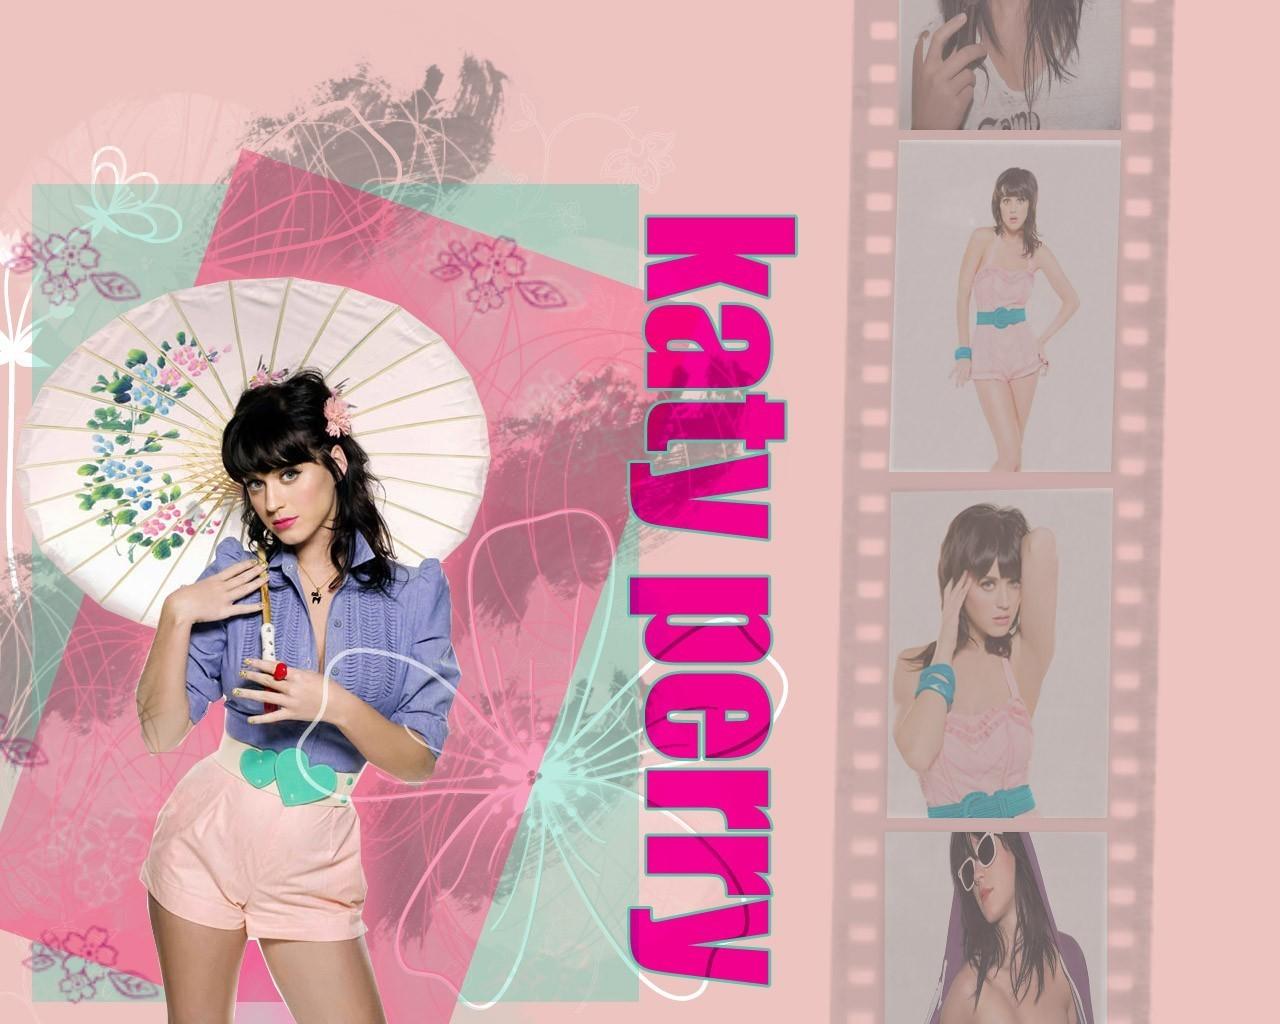 http://4.bp.blogspot.com/-p4ZzWuu-t1Q/T-yk0lO8YeI/AAAAAAAAADk/ZaVM5-hWmAM/s1600/Katy+Perry+3.jpg